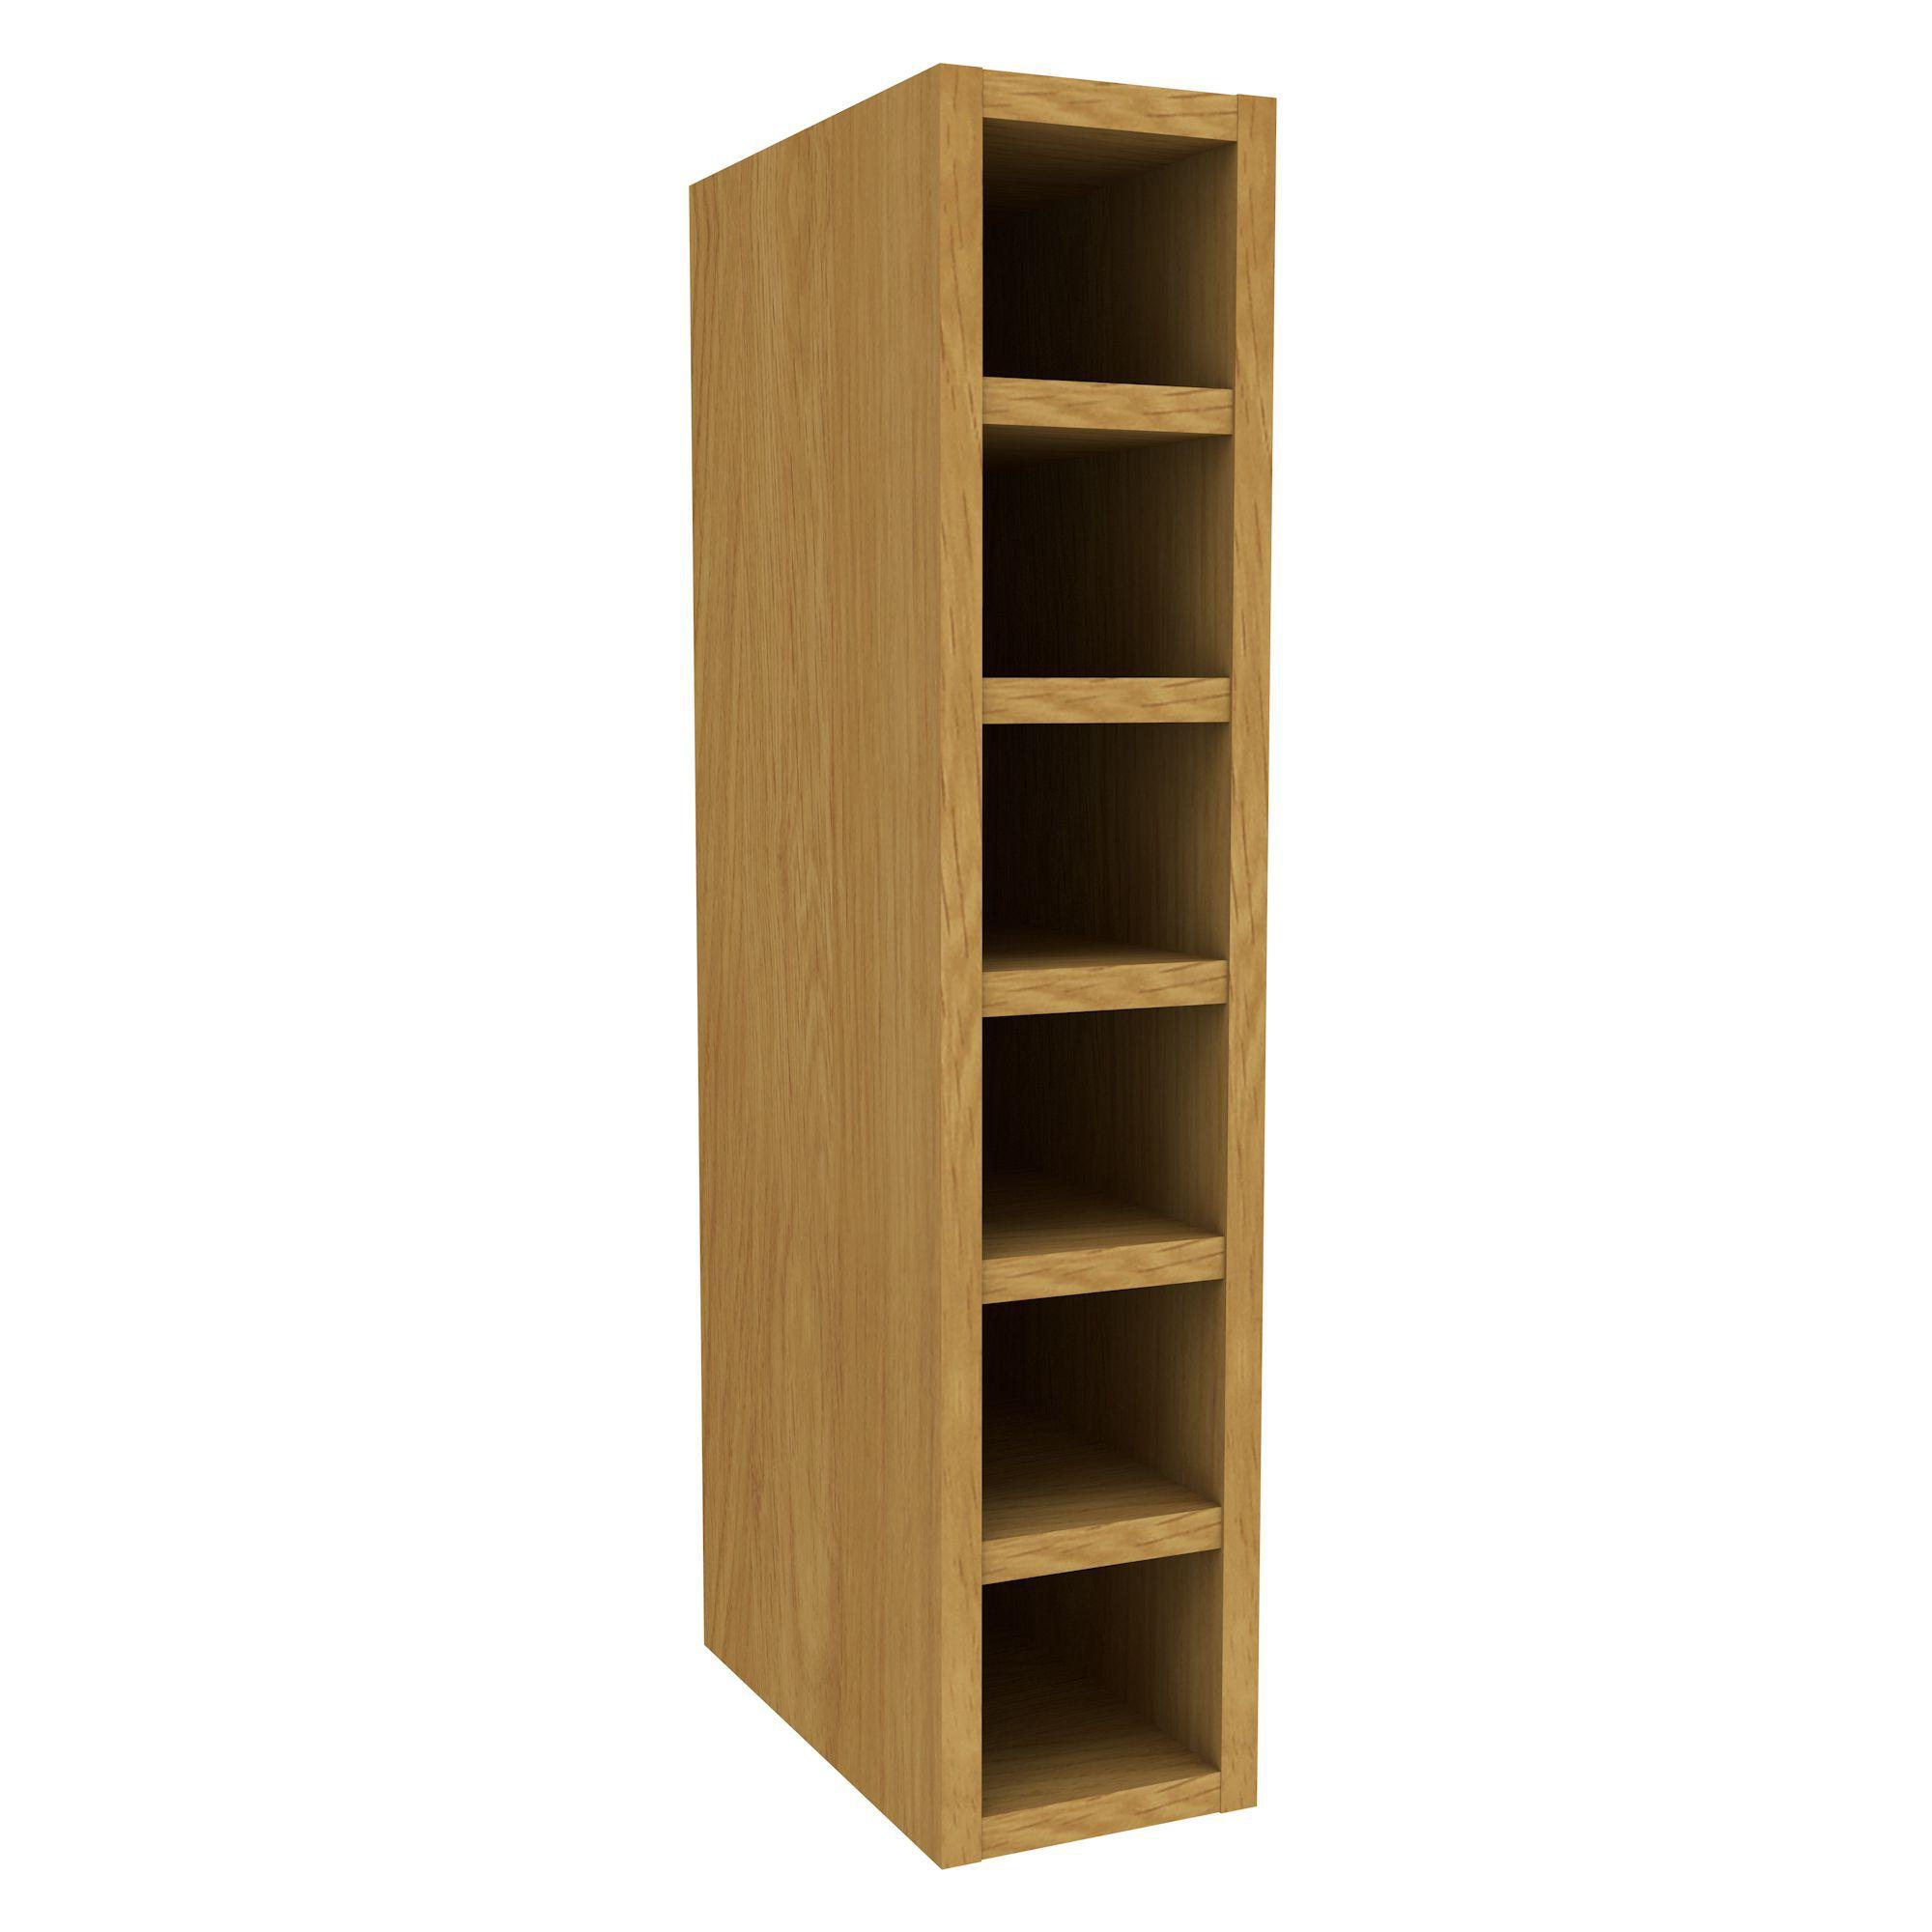 Cooke lewis oak effect wine rack wall cabinet w 150mm for Building a wine rack in a cabinet